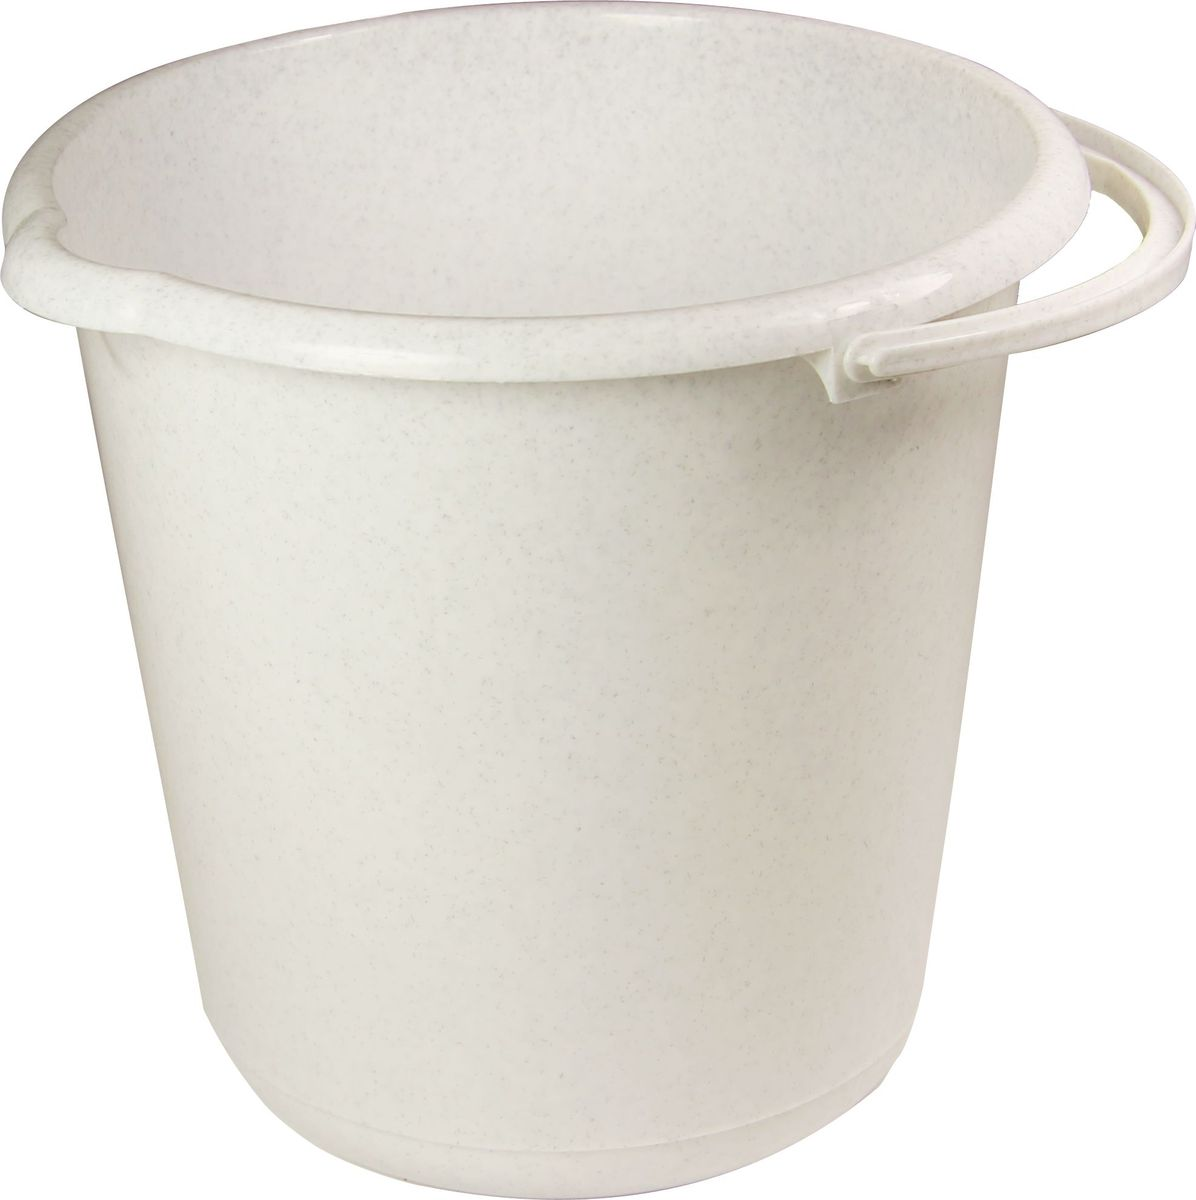 Ведро хозяйственное Idea, цвет: мраморный, 15 л ведро хозяйственное idea цвет мраморный 3 л